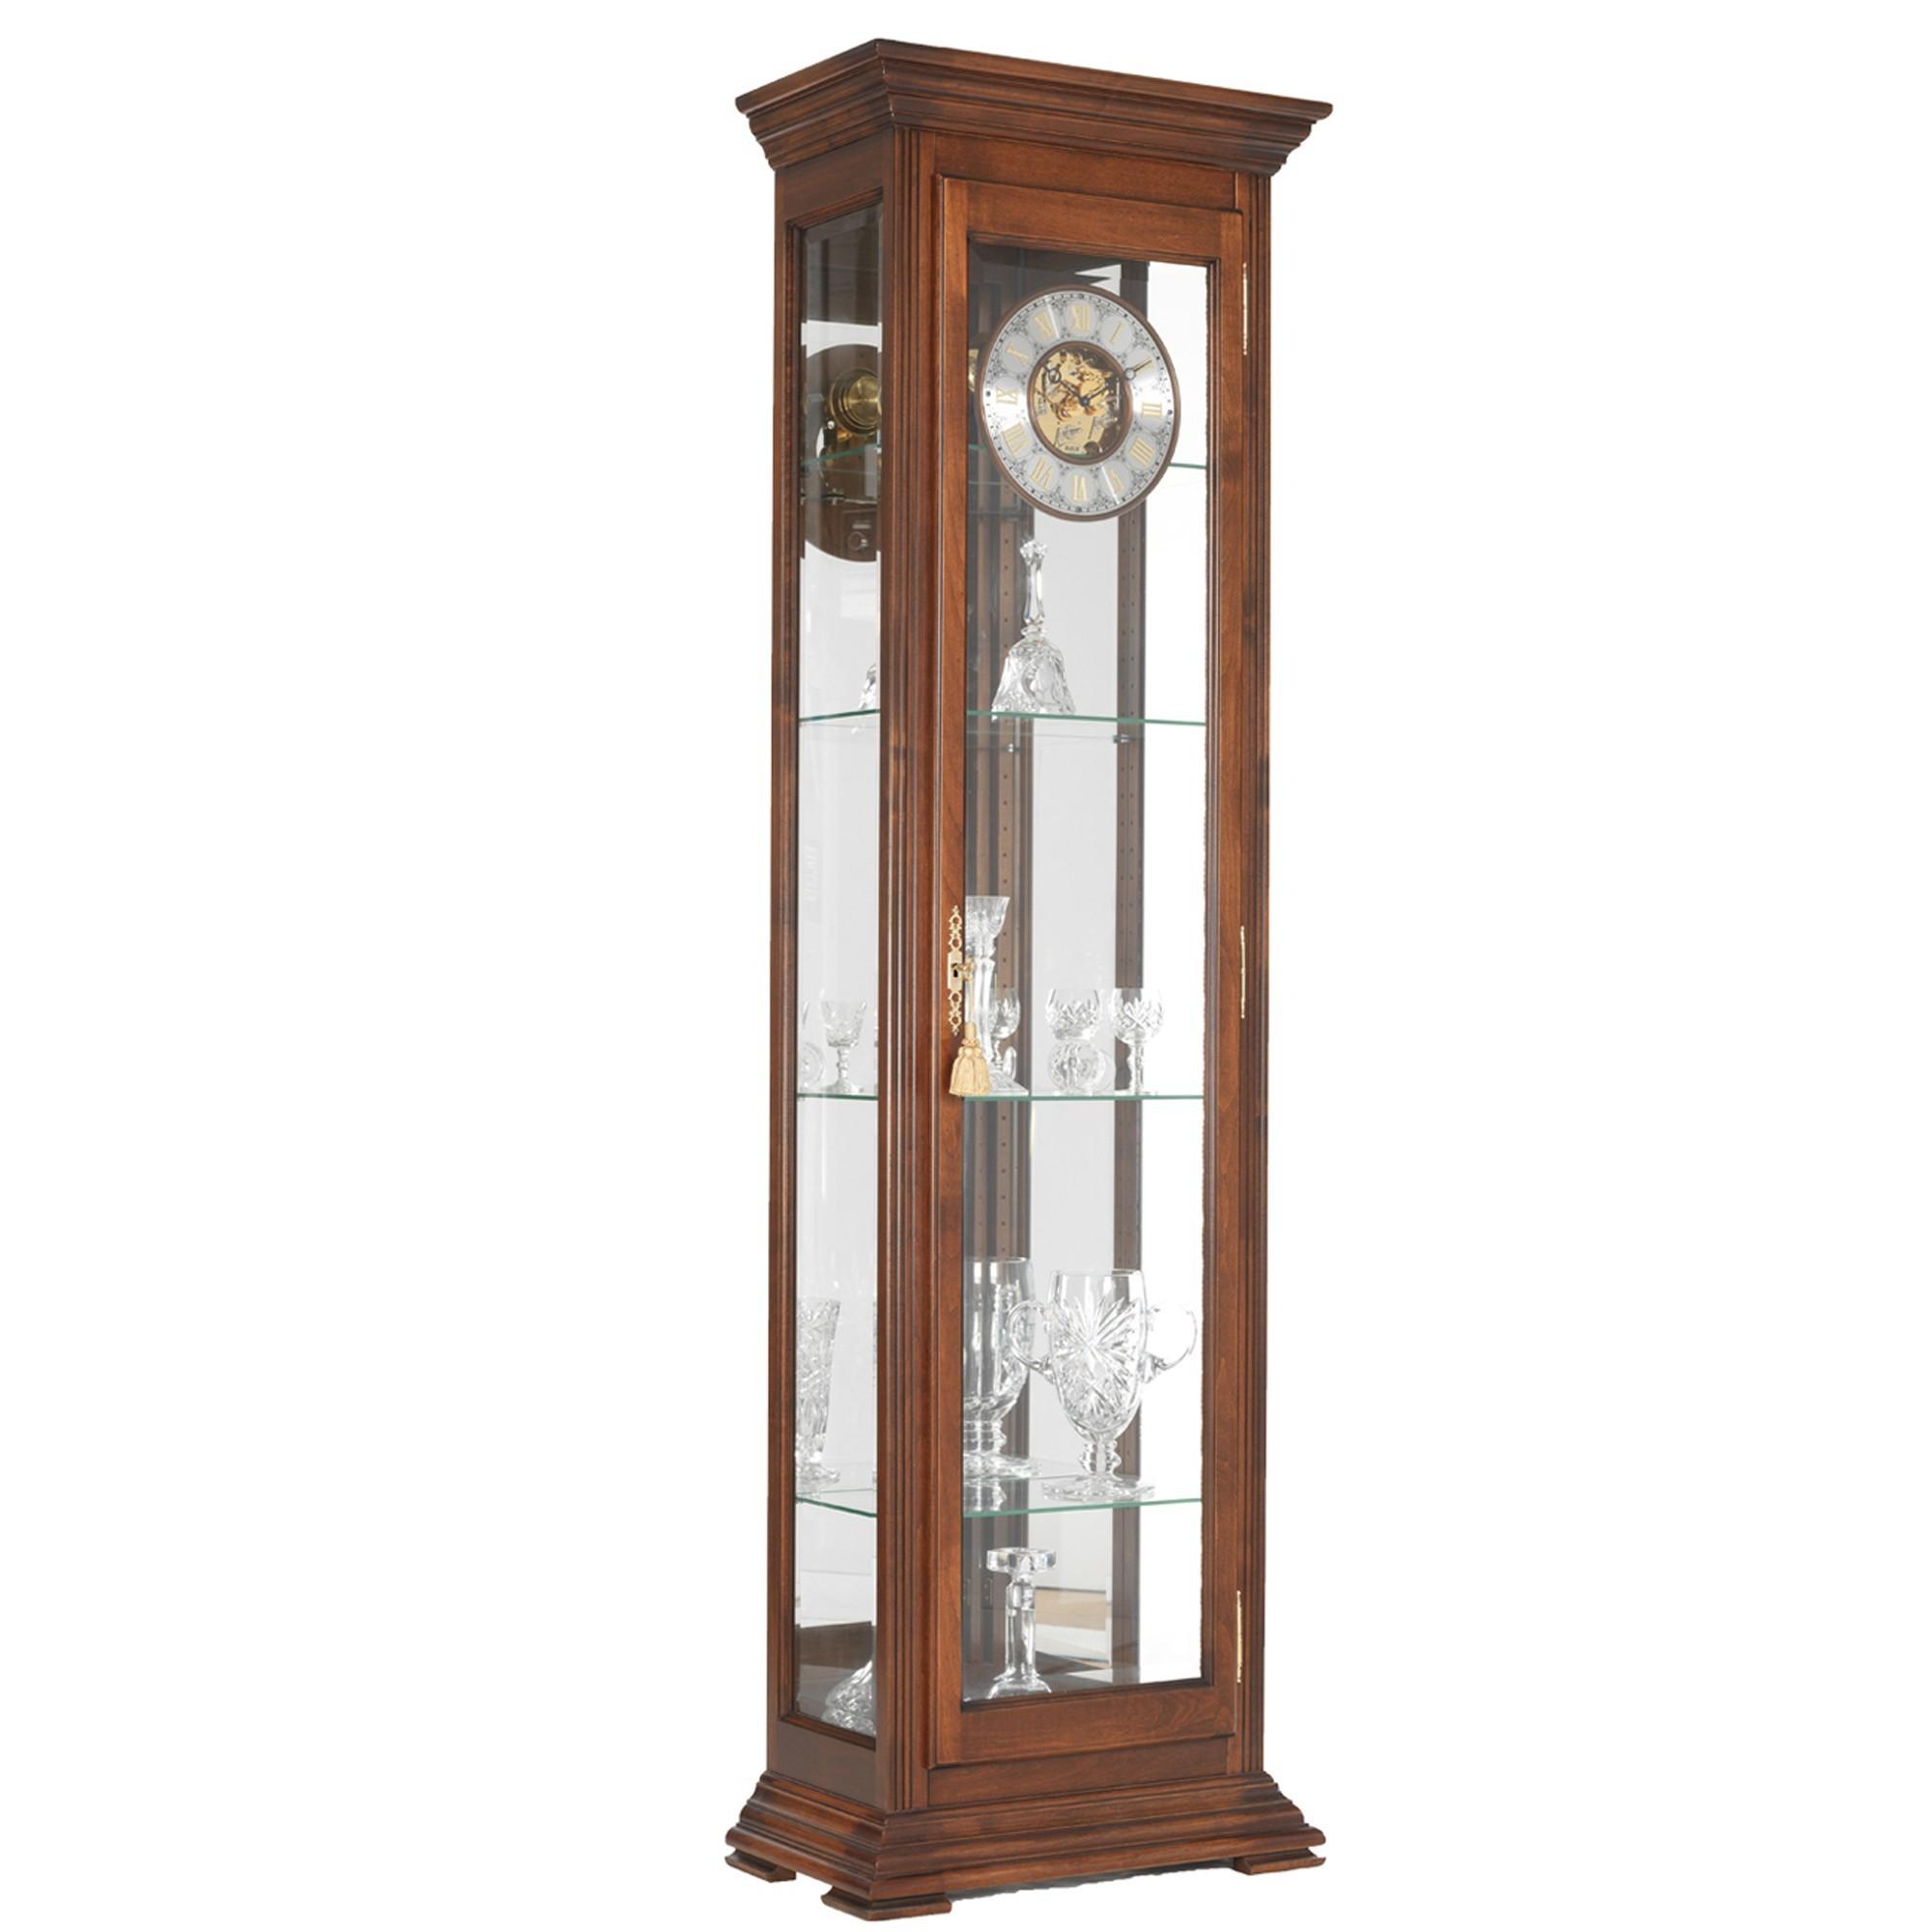 Walnut Curio Clock Grandfather Clocks Cookes Furniture